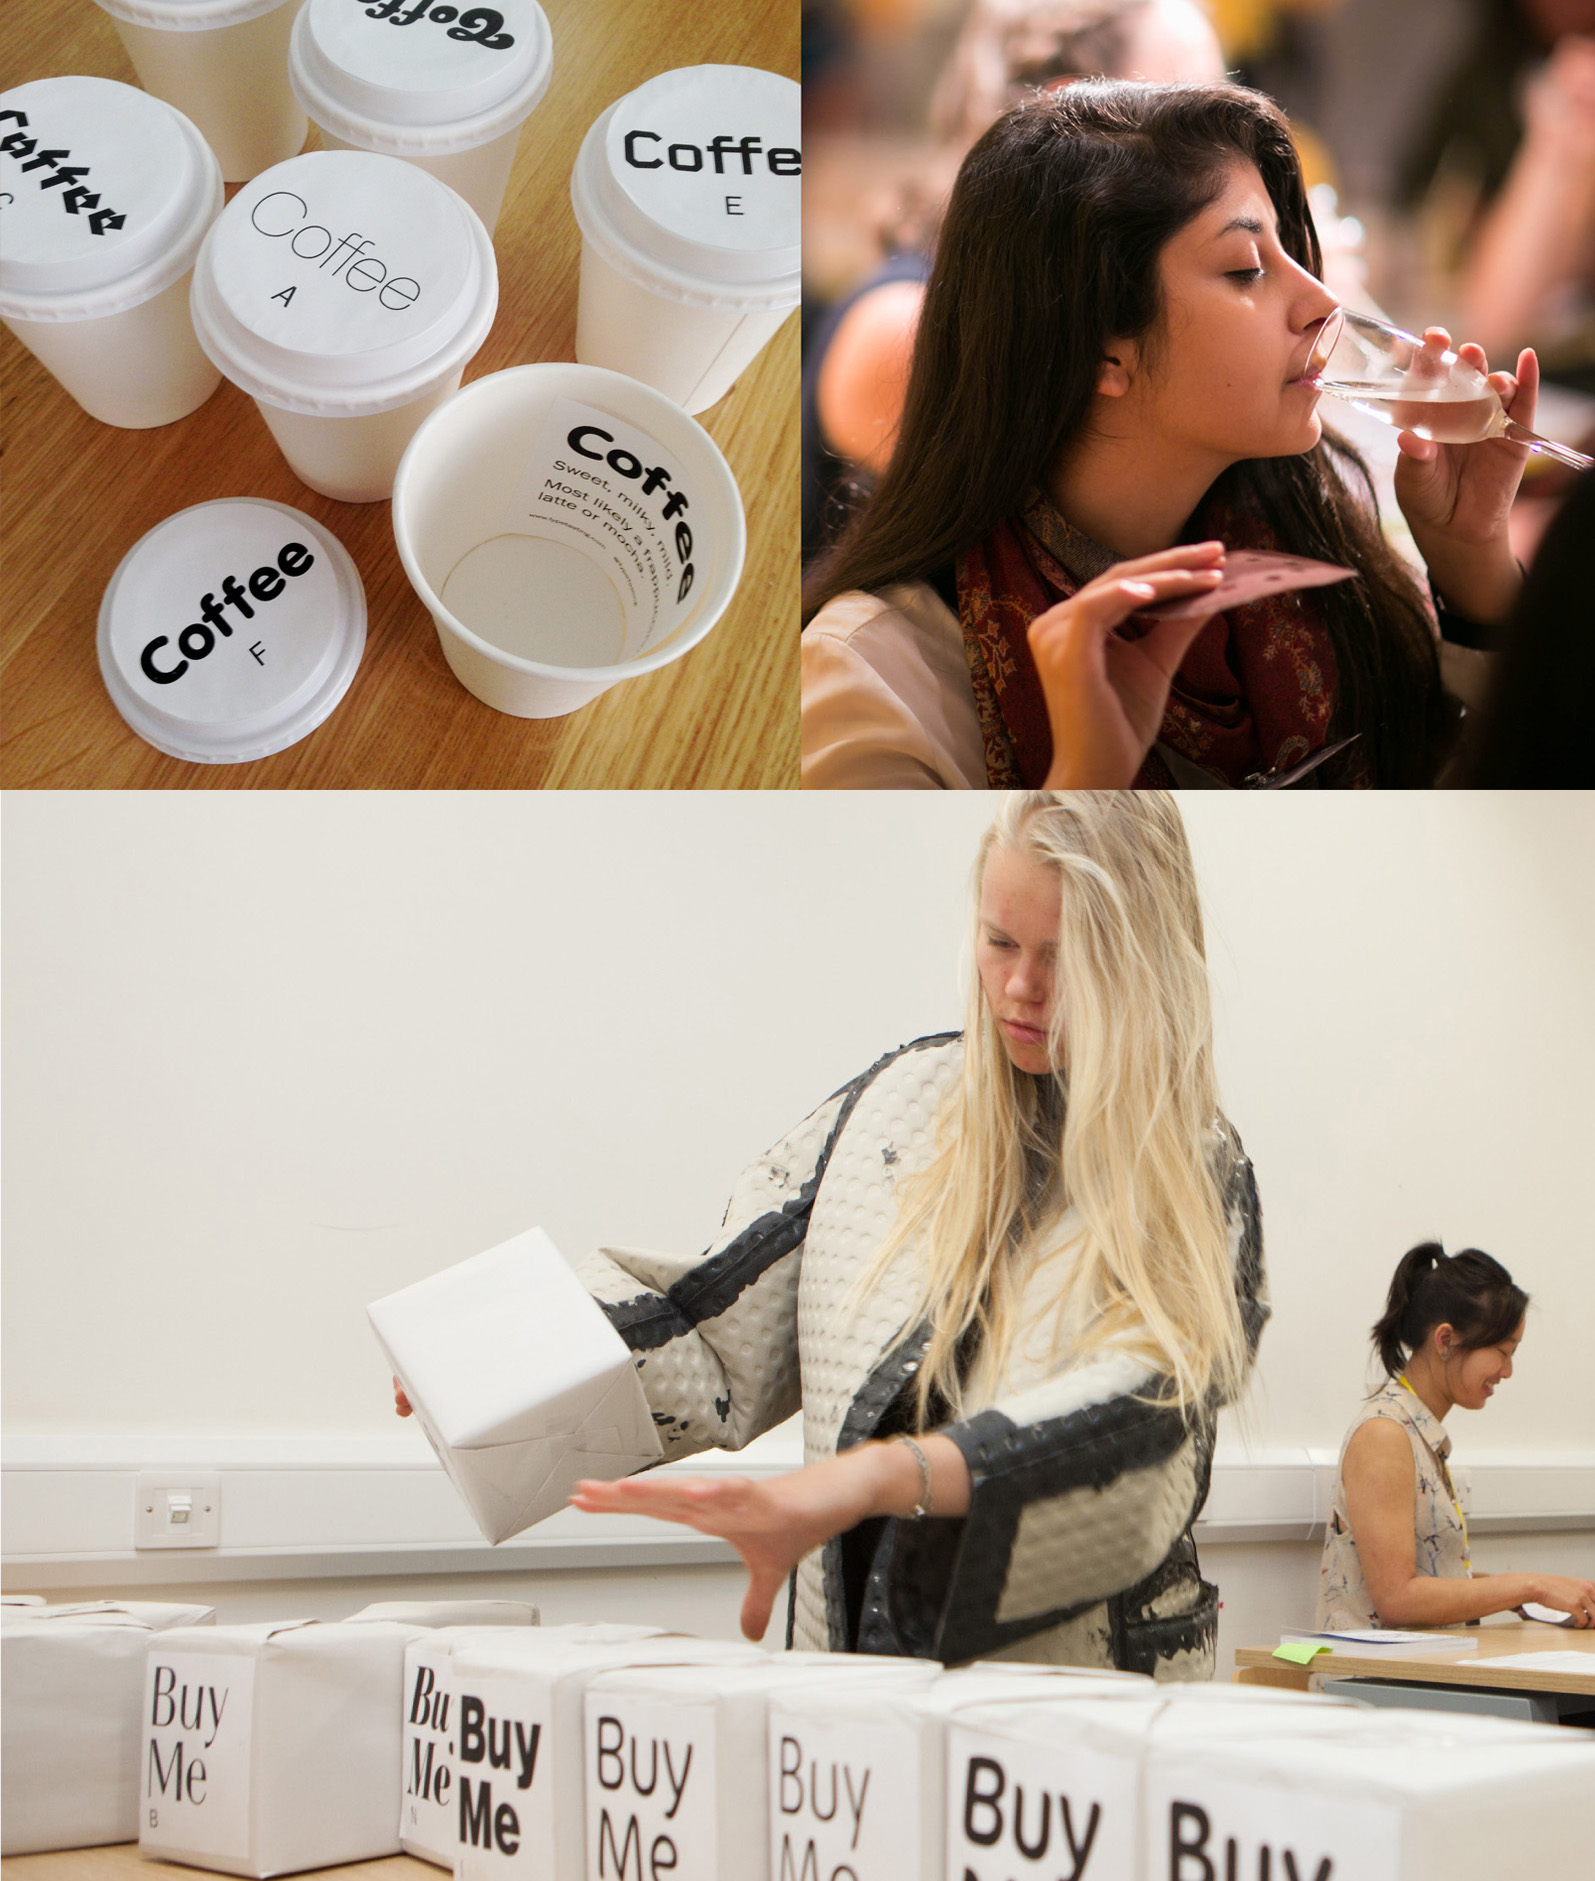 Type Tasting workshops